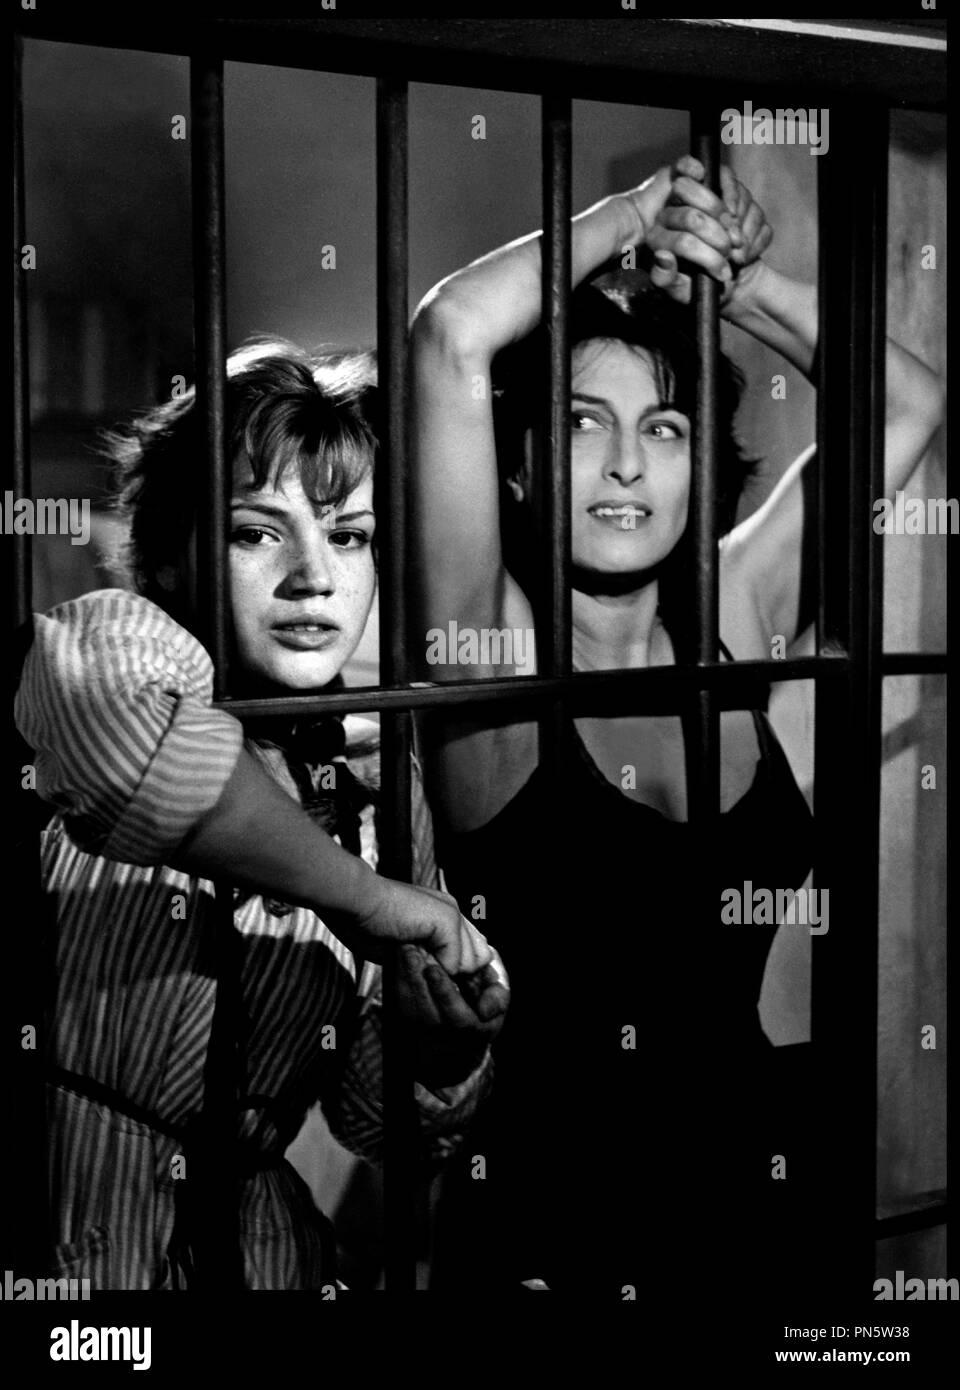 Simenona Martinez,Gena Lee Nolin born November 29, 1971 (age 46) Erotic picture Sally Champlin,Lois Kibbee